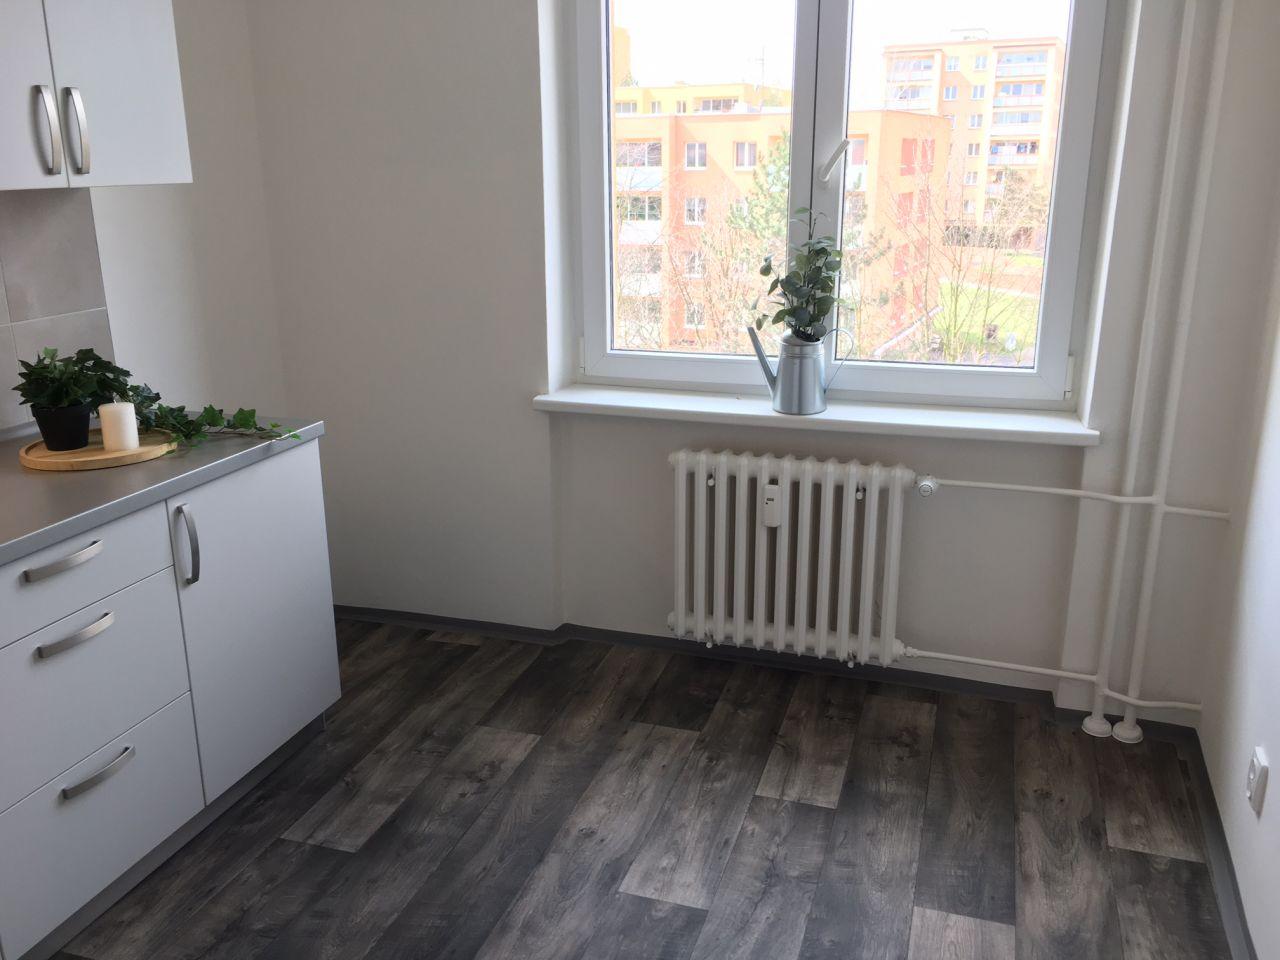 Pronájem bytu 1+1 39 m2, ul. Fojtská 637/9, Ostrava - Muglinov